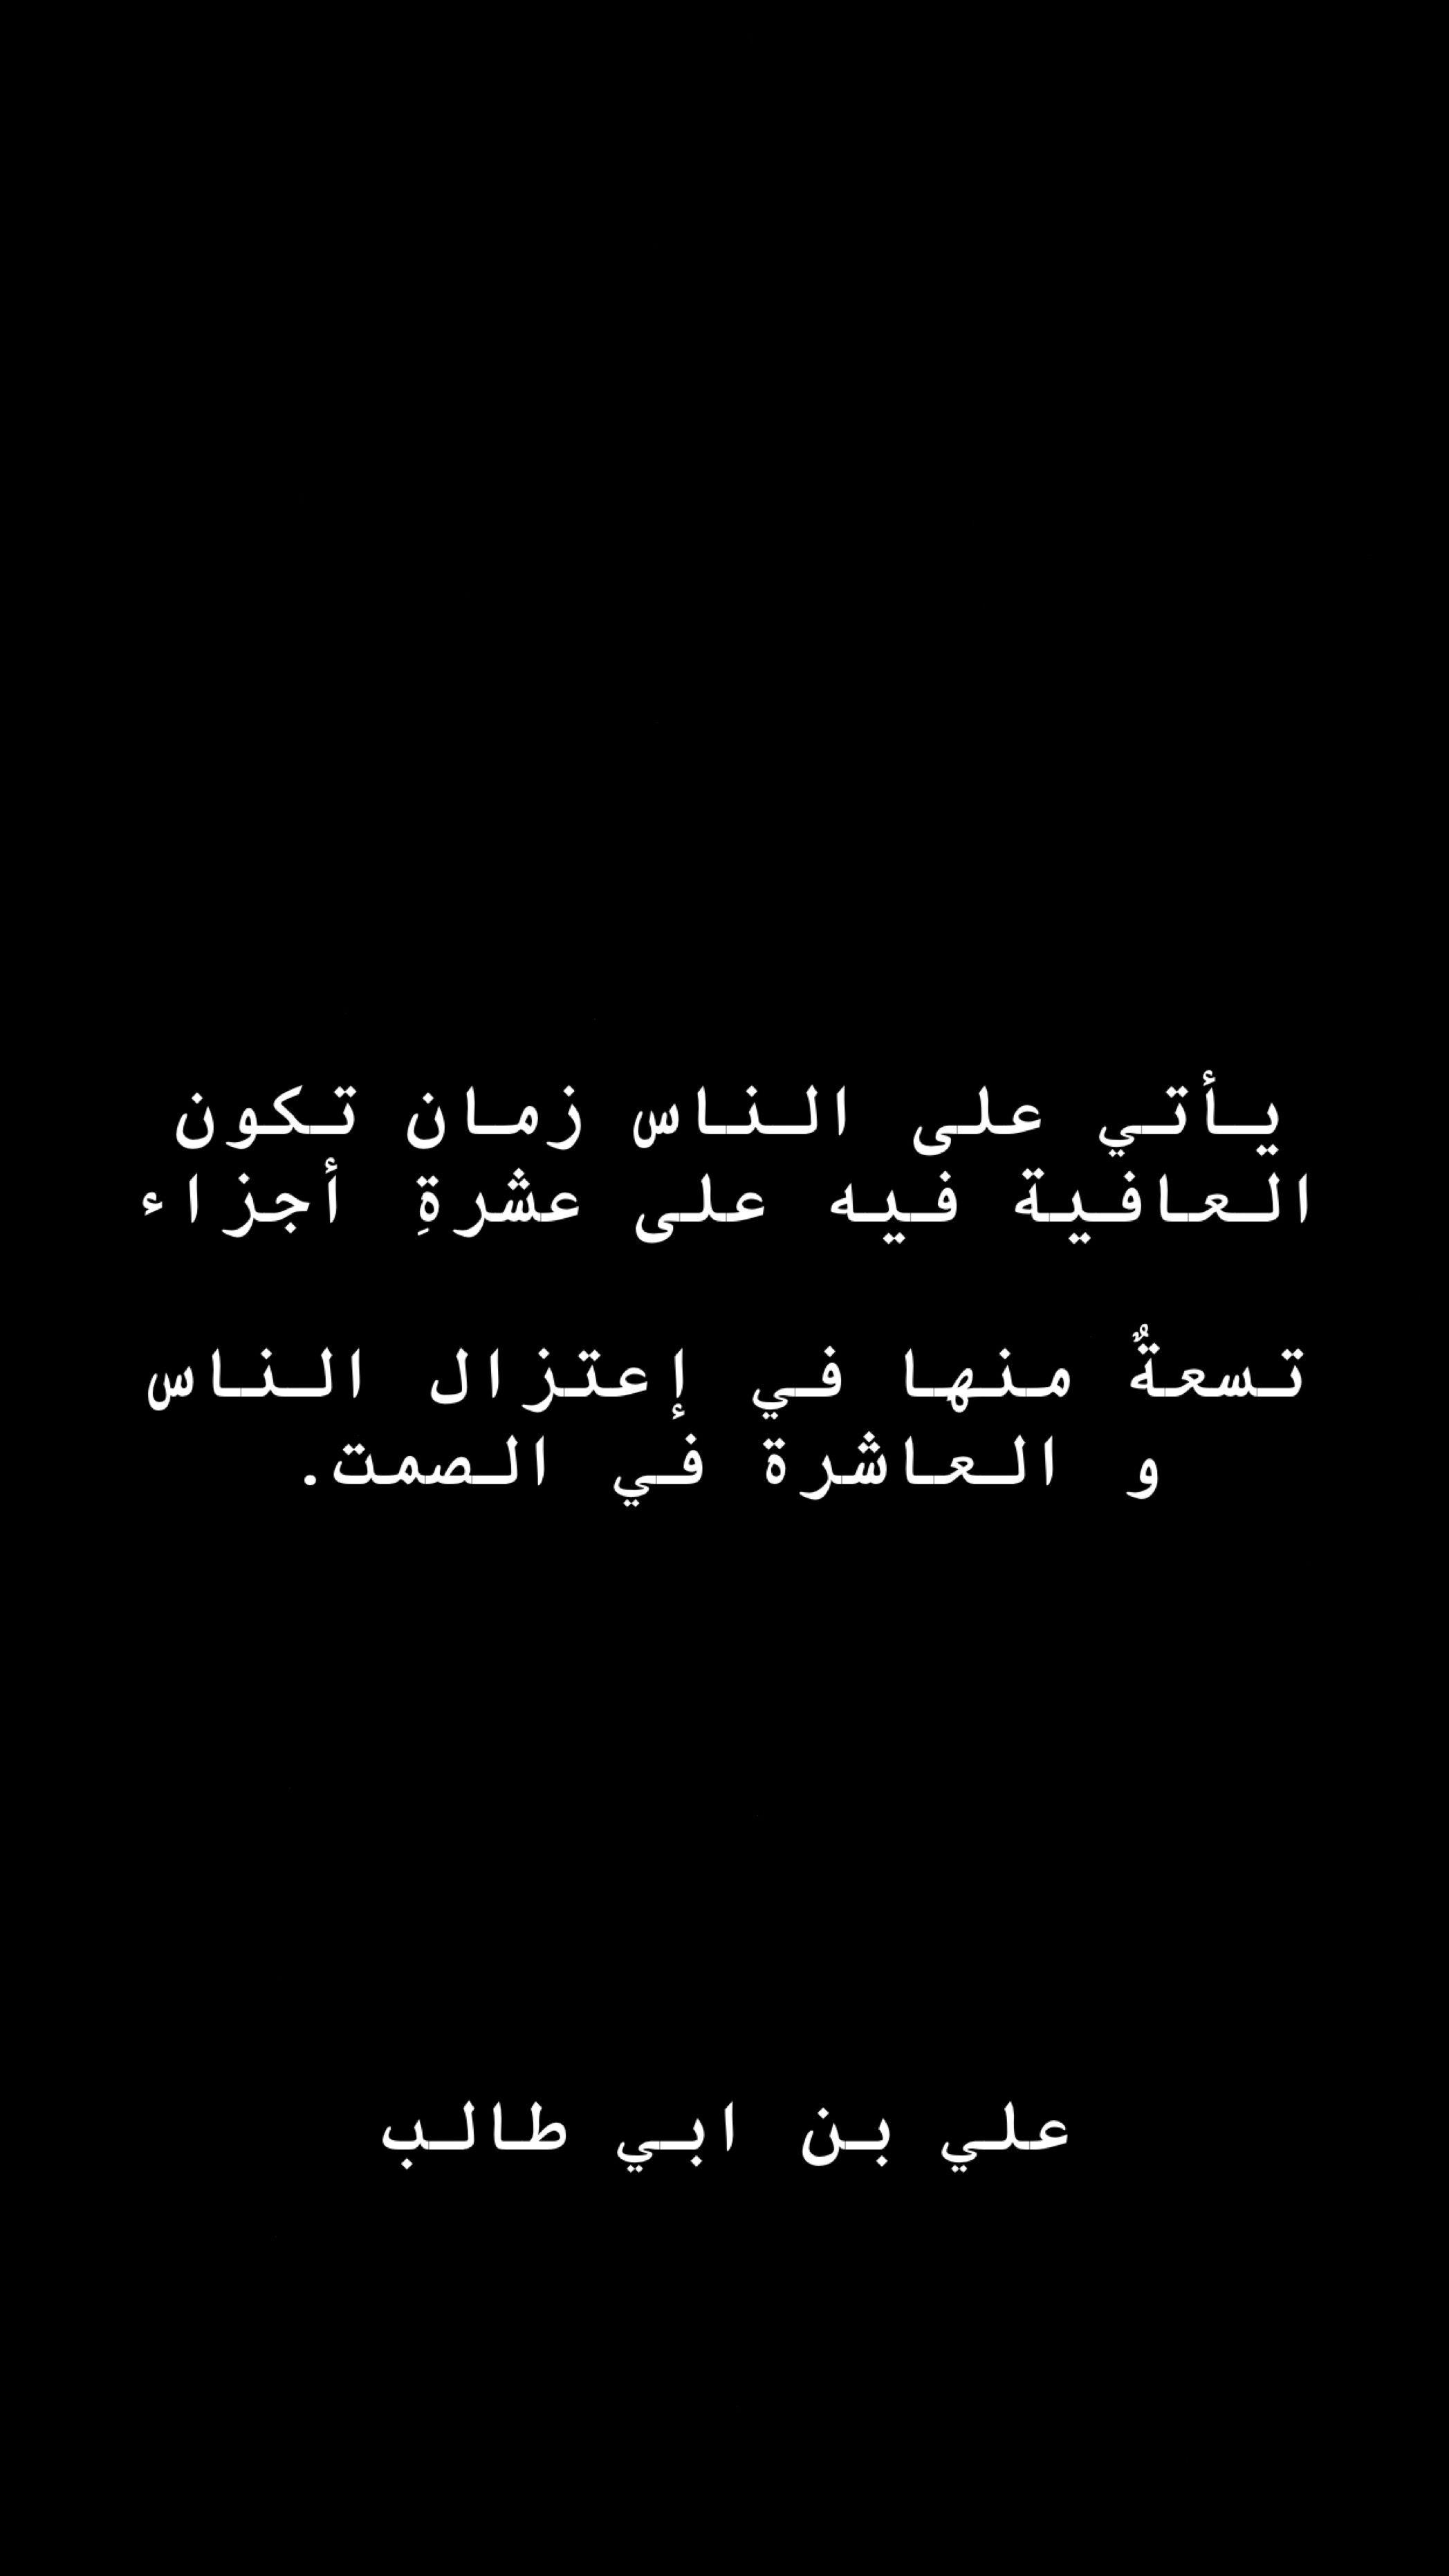 Quotes اقتباسات Words Quotes Quotes Islamic Inspirational Quotes